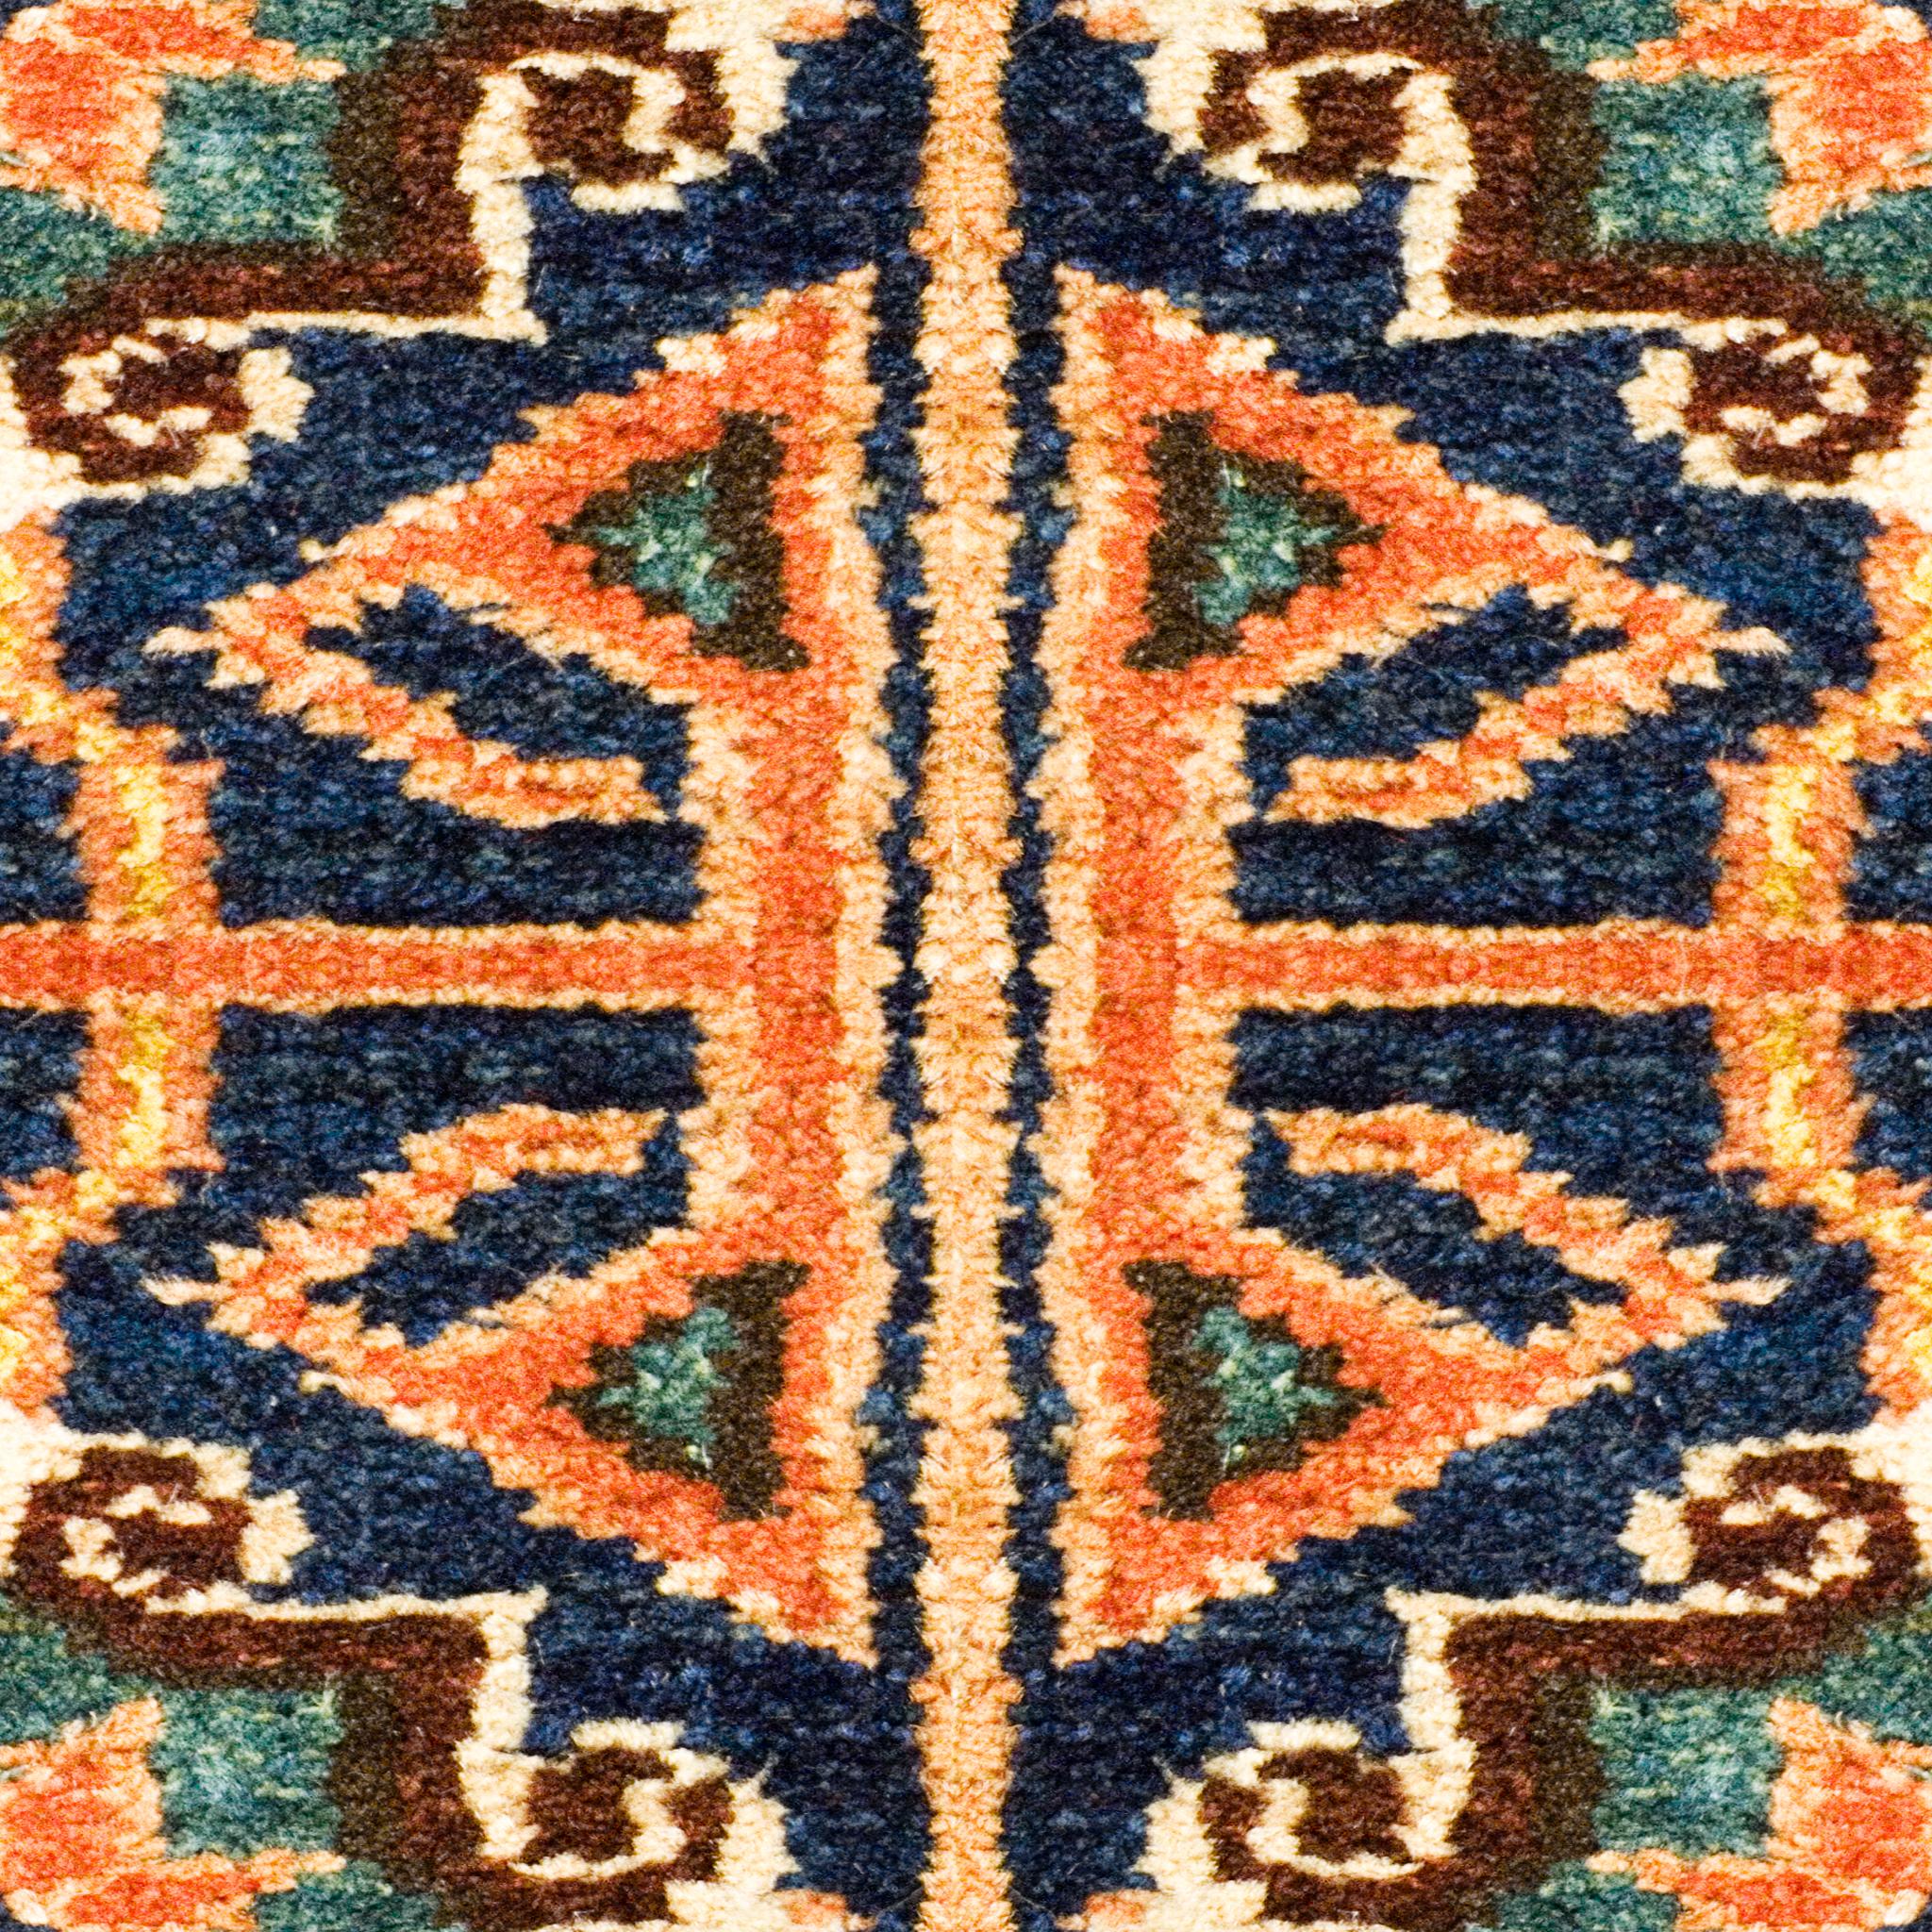 Cultural Bond Carpet.jpg